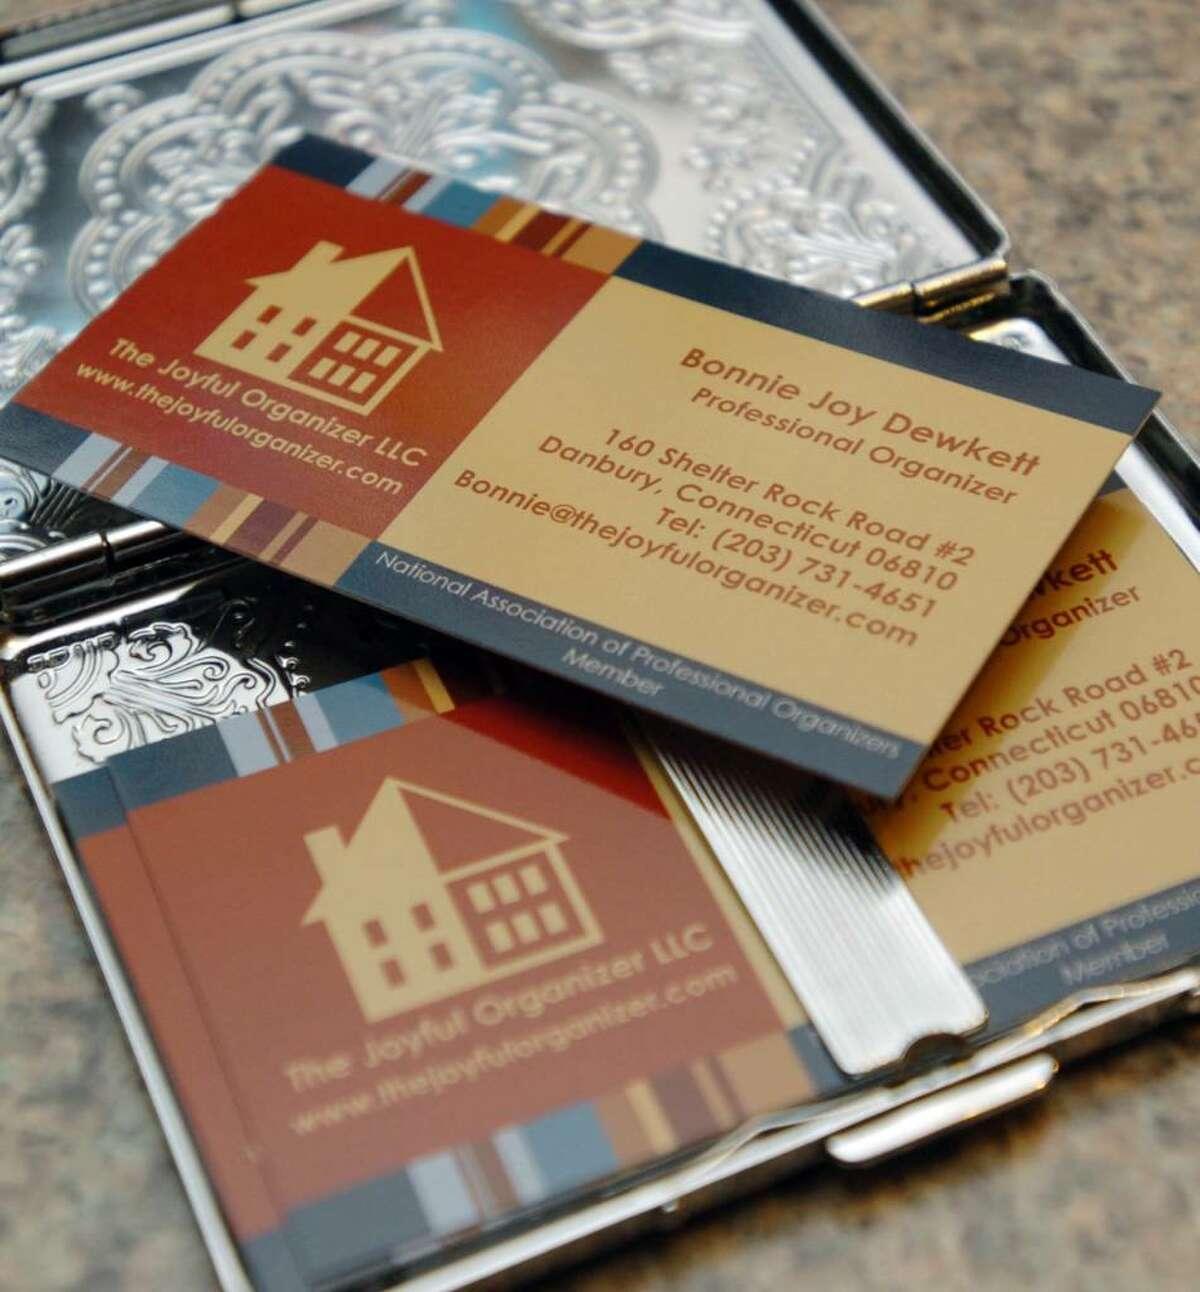 Business cards from professional organizer Bonnie Dewkett, Monday, Dec. 28, 2009.